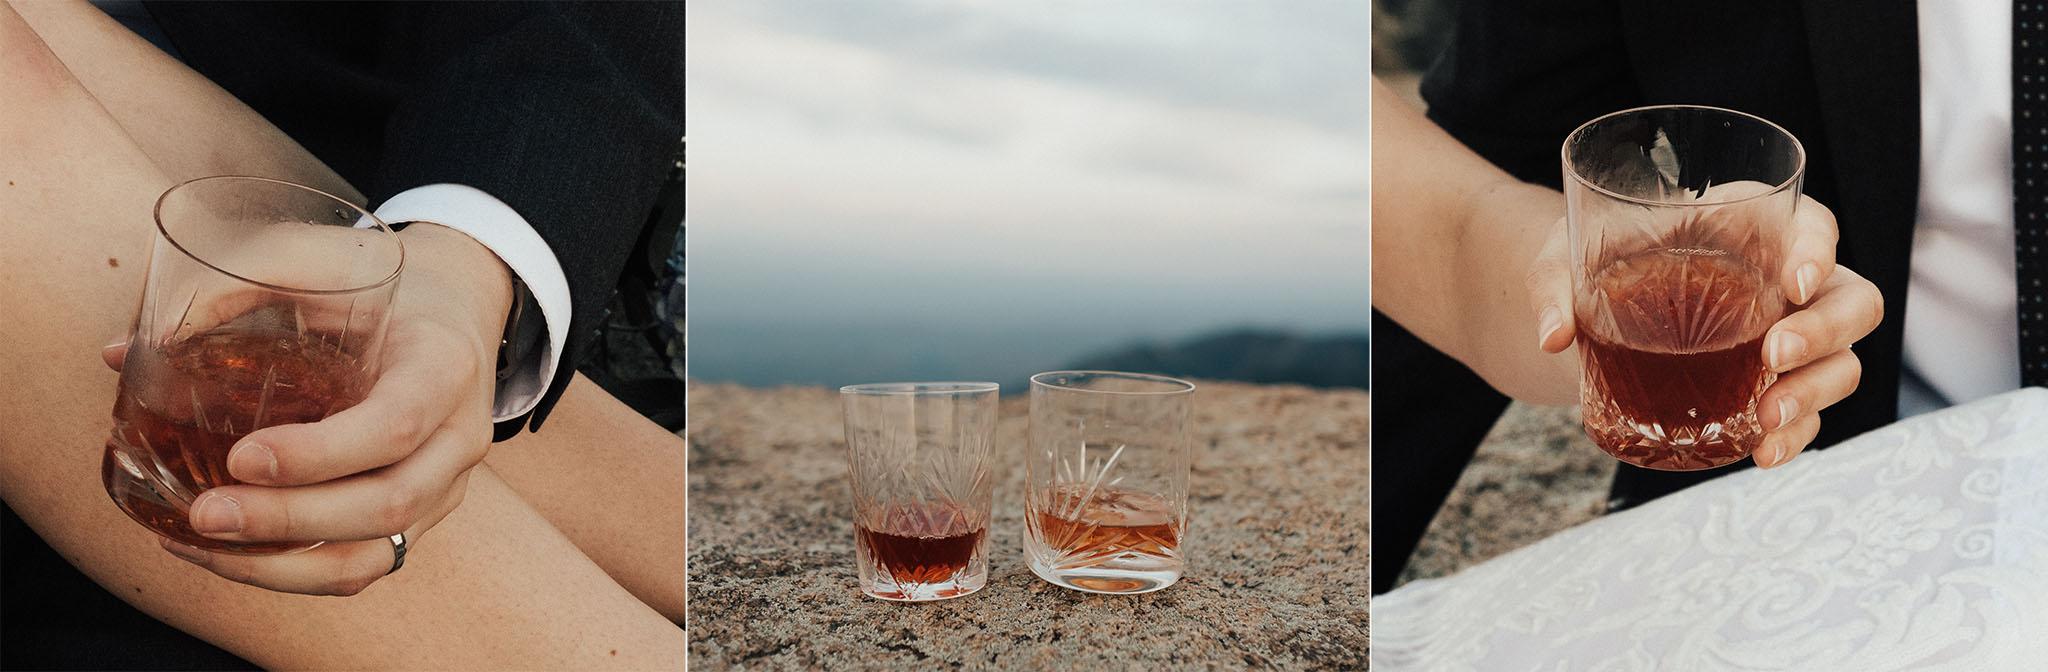 Arizona-Intimate-Elopement-Adventure-Photographer-Mount-Lemmon (25).jpg